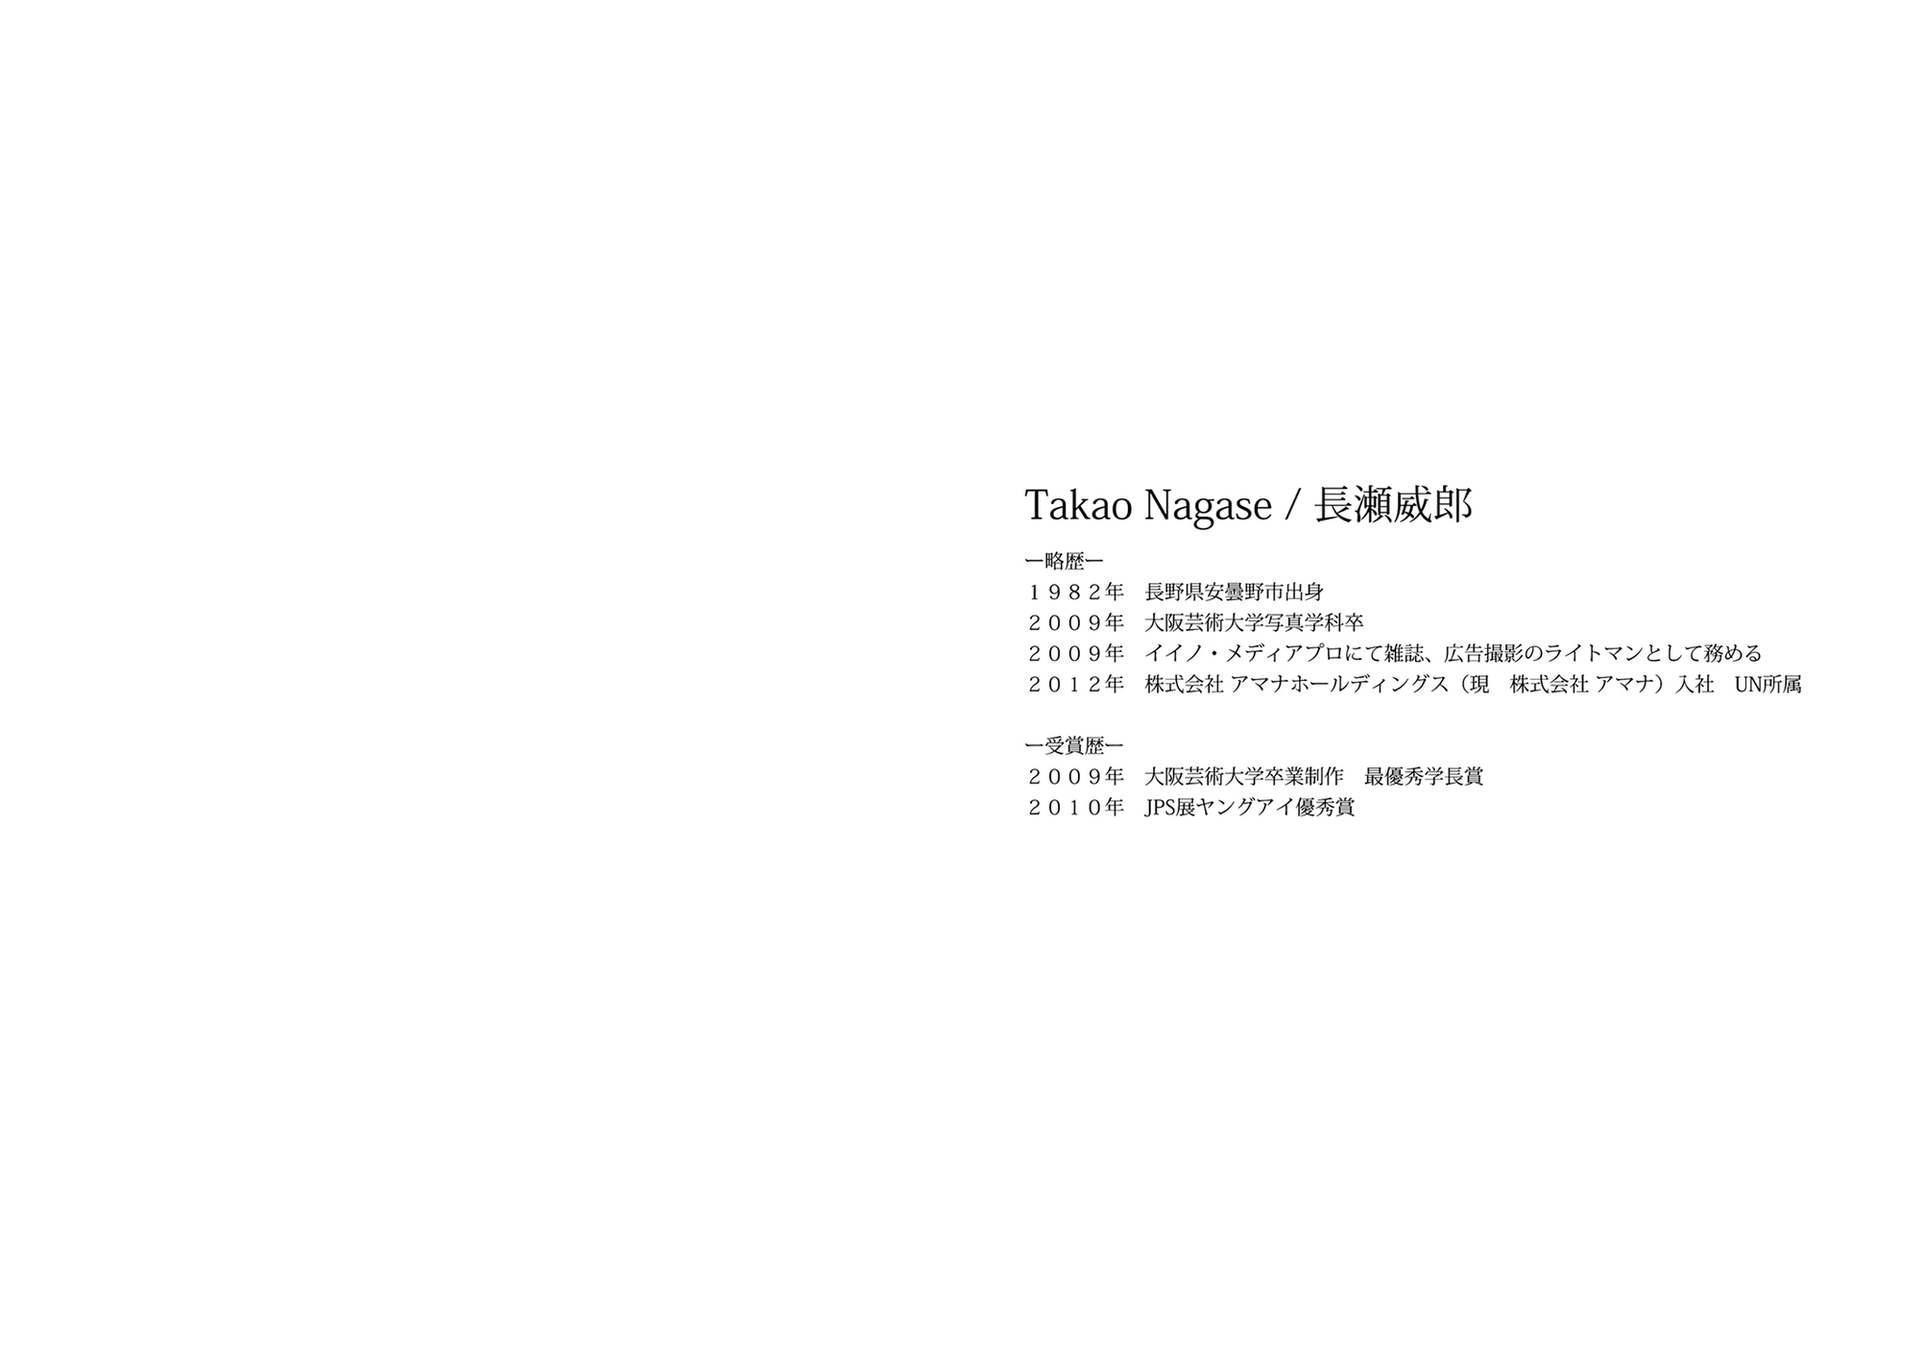 x_nagase_profile_00.jpg